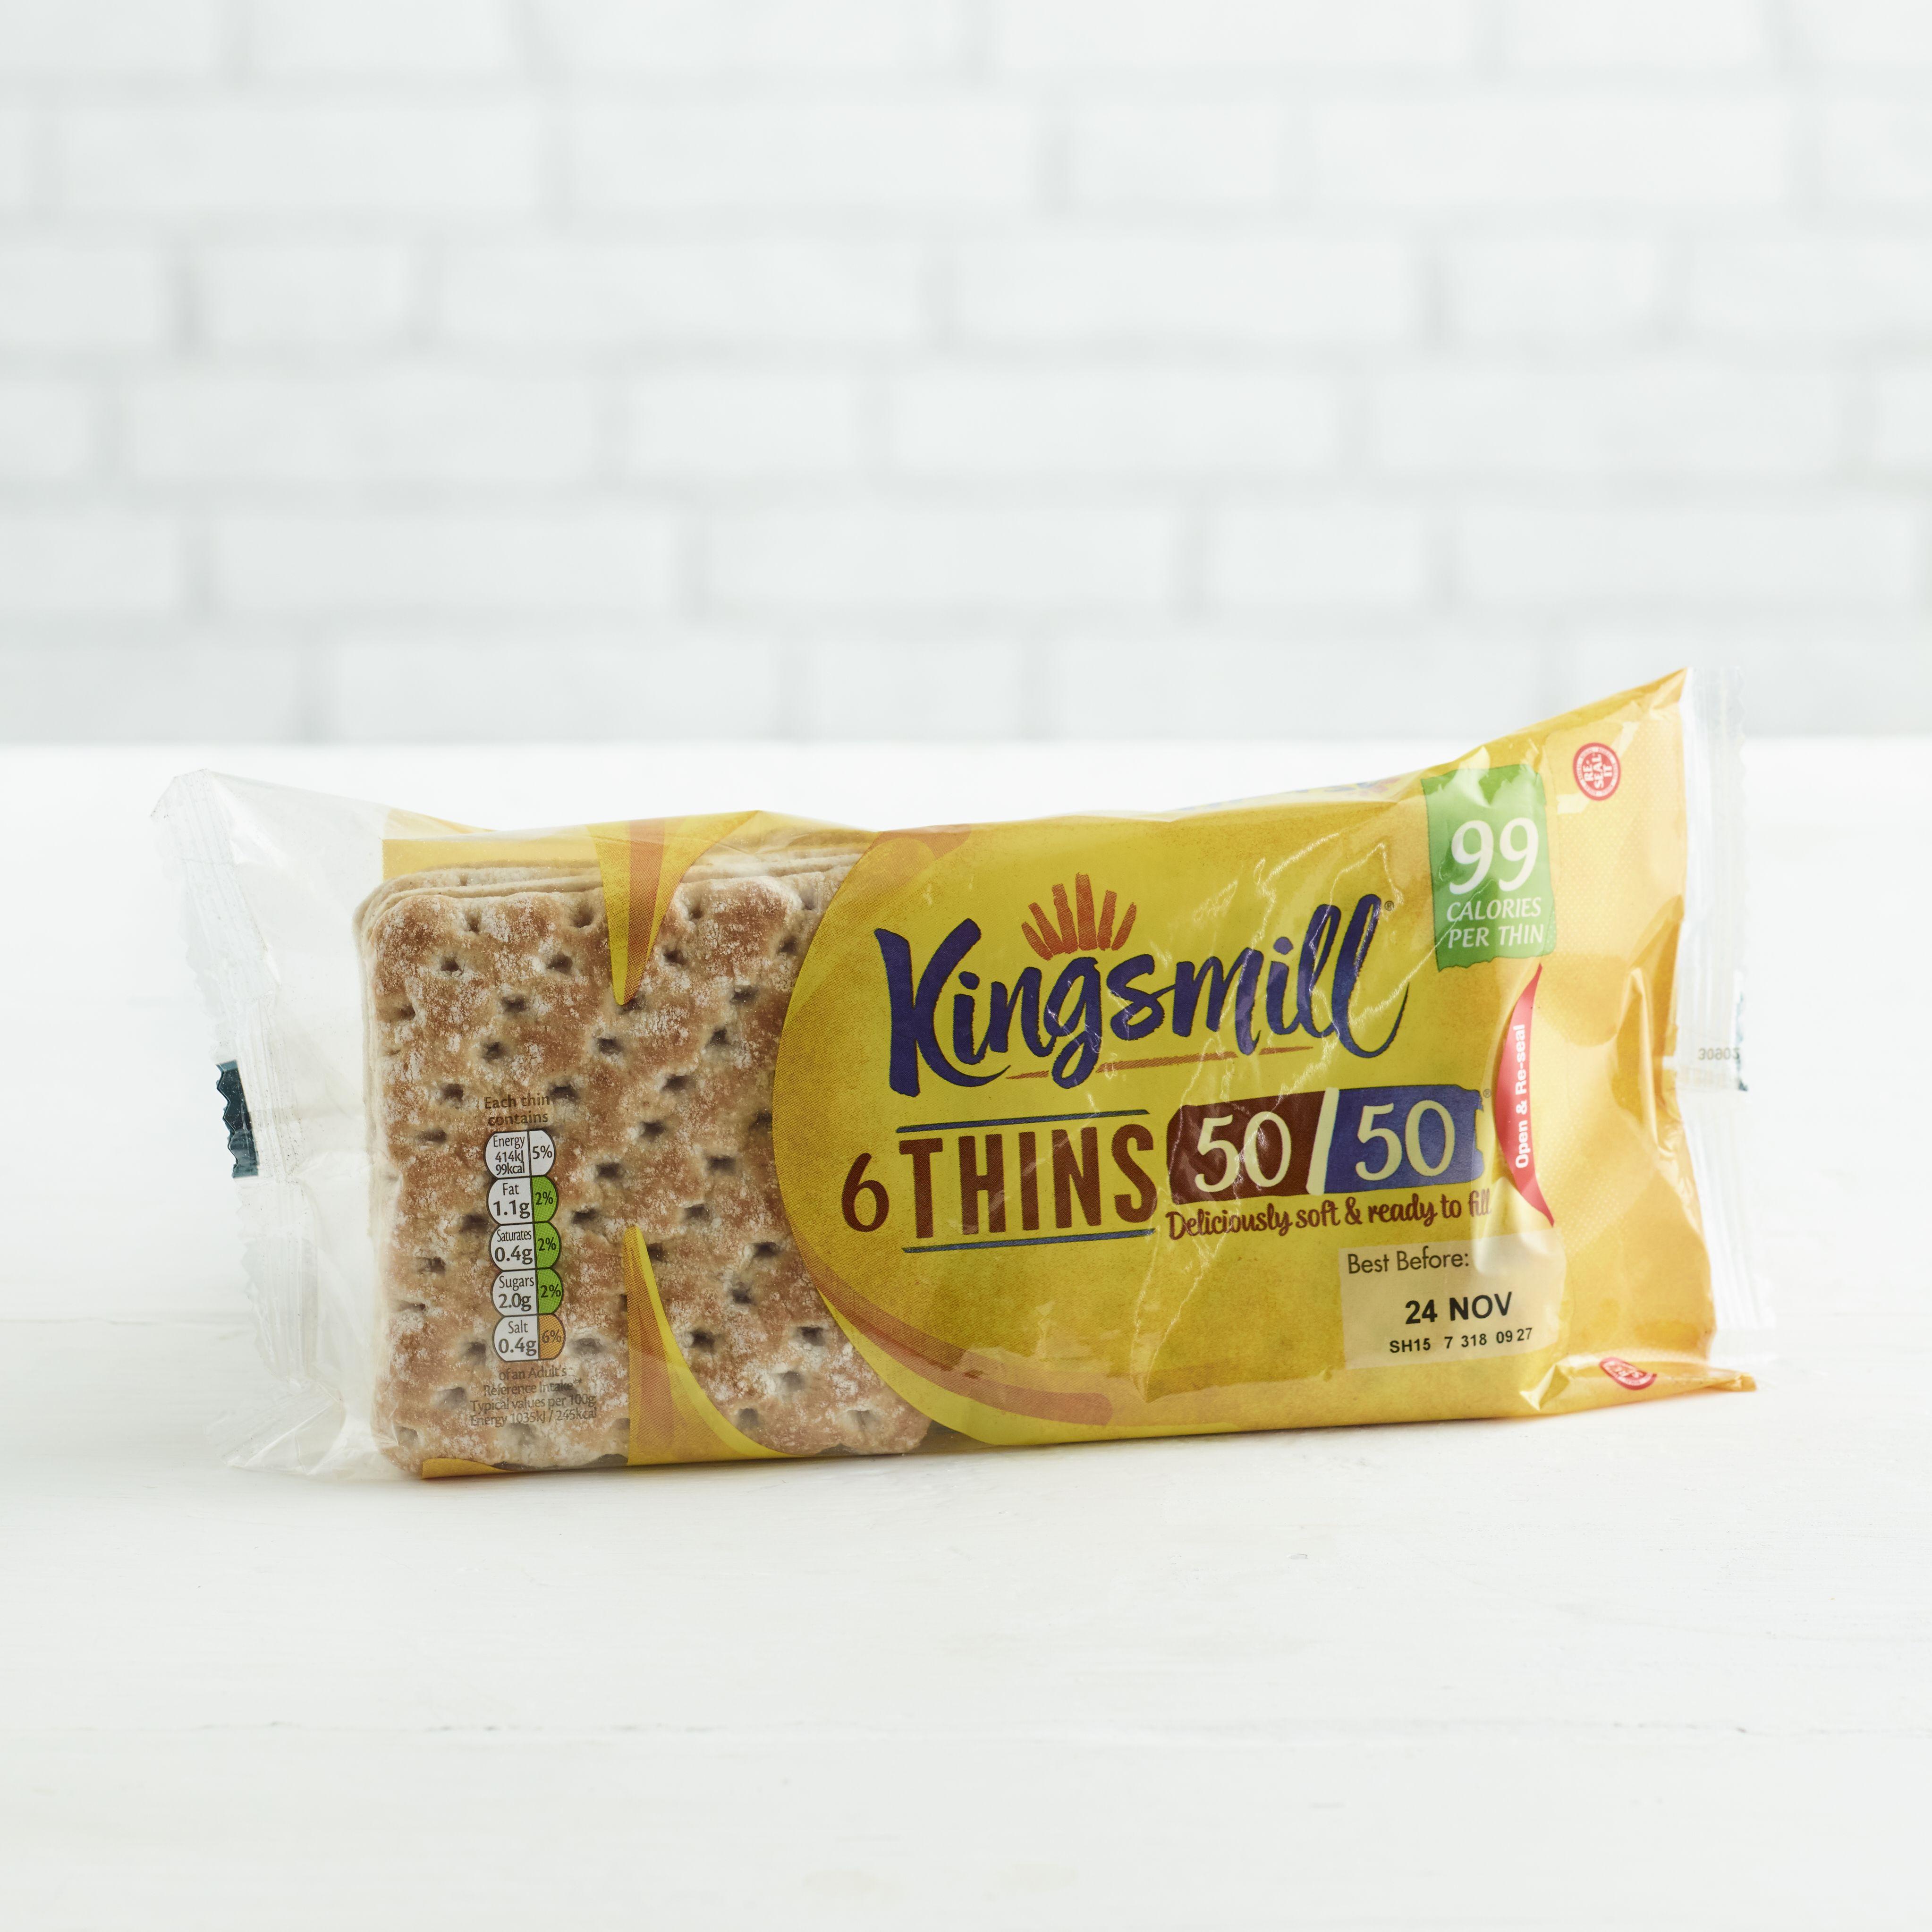 Kingsmill 50/50 Sandwich Thins, 6 pack